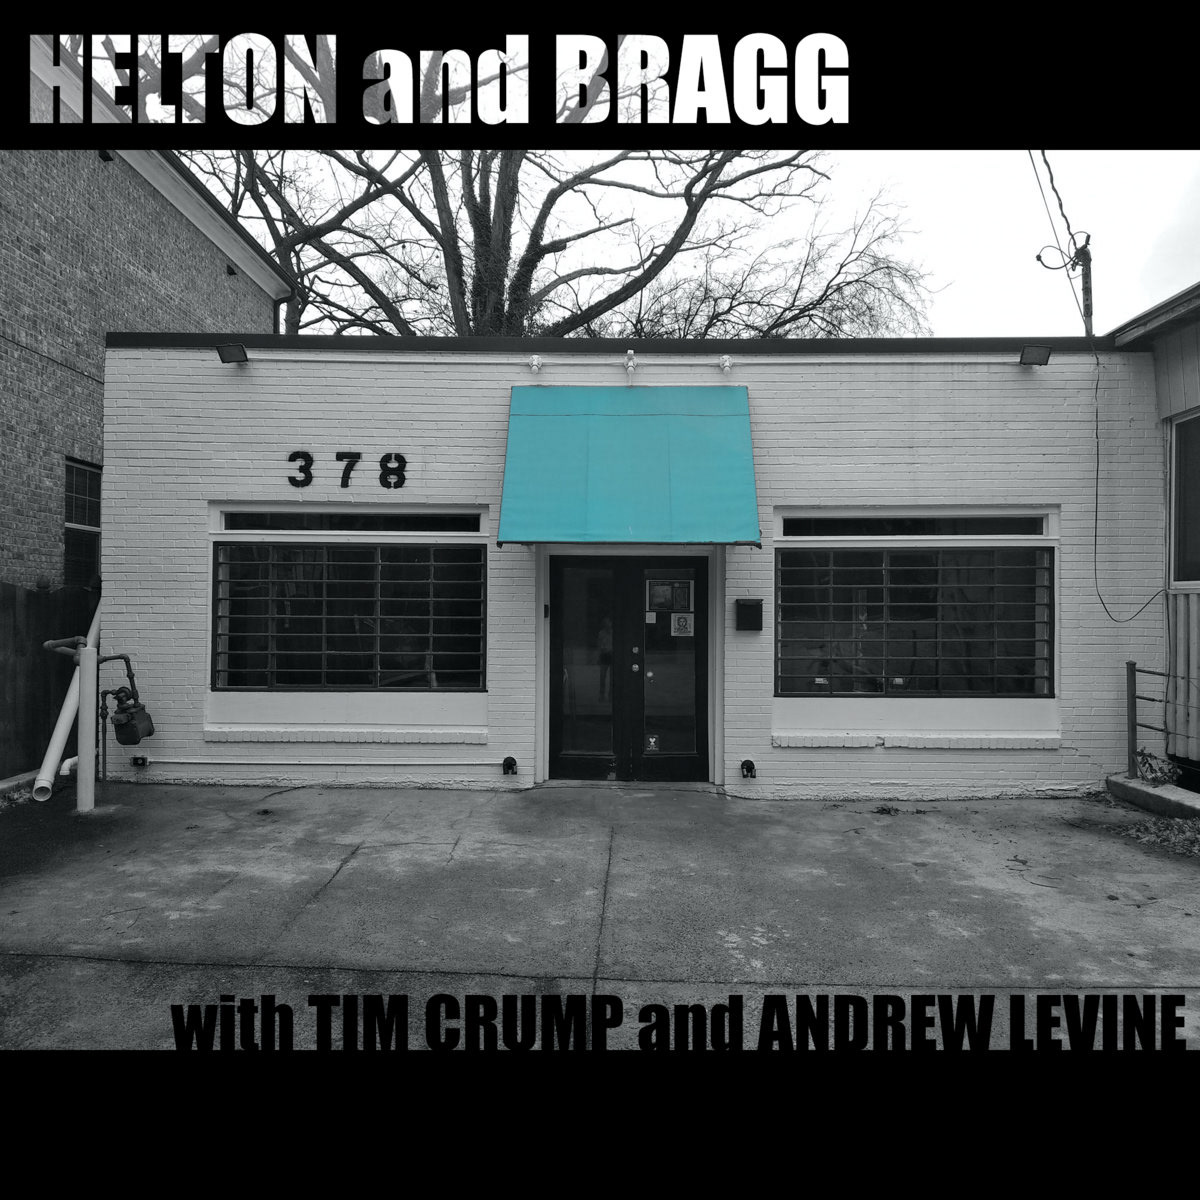 Album design by Colin Bragg for Helton and Bragg